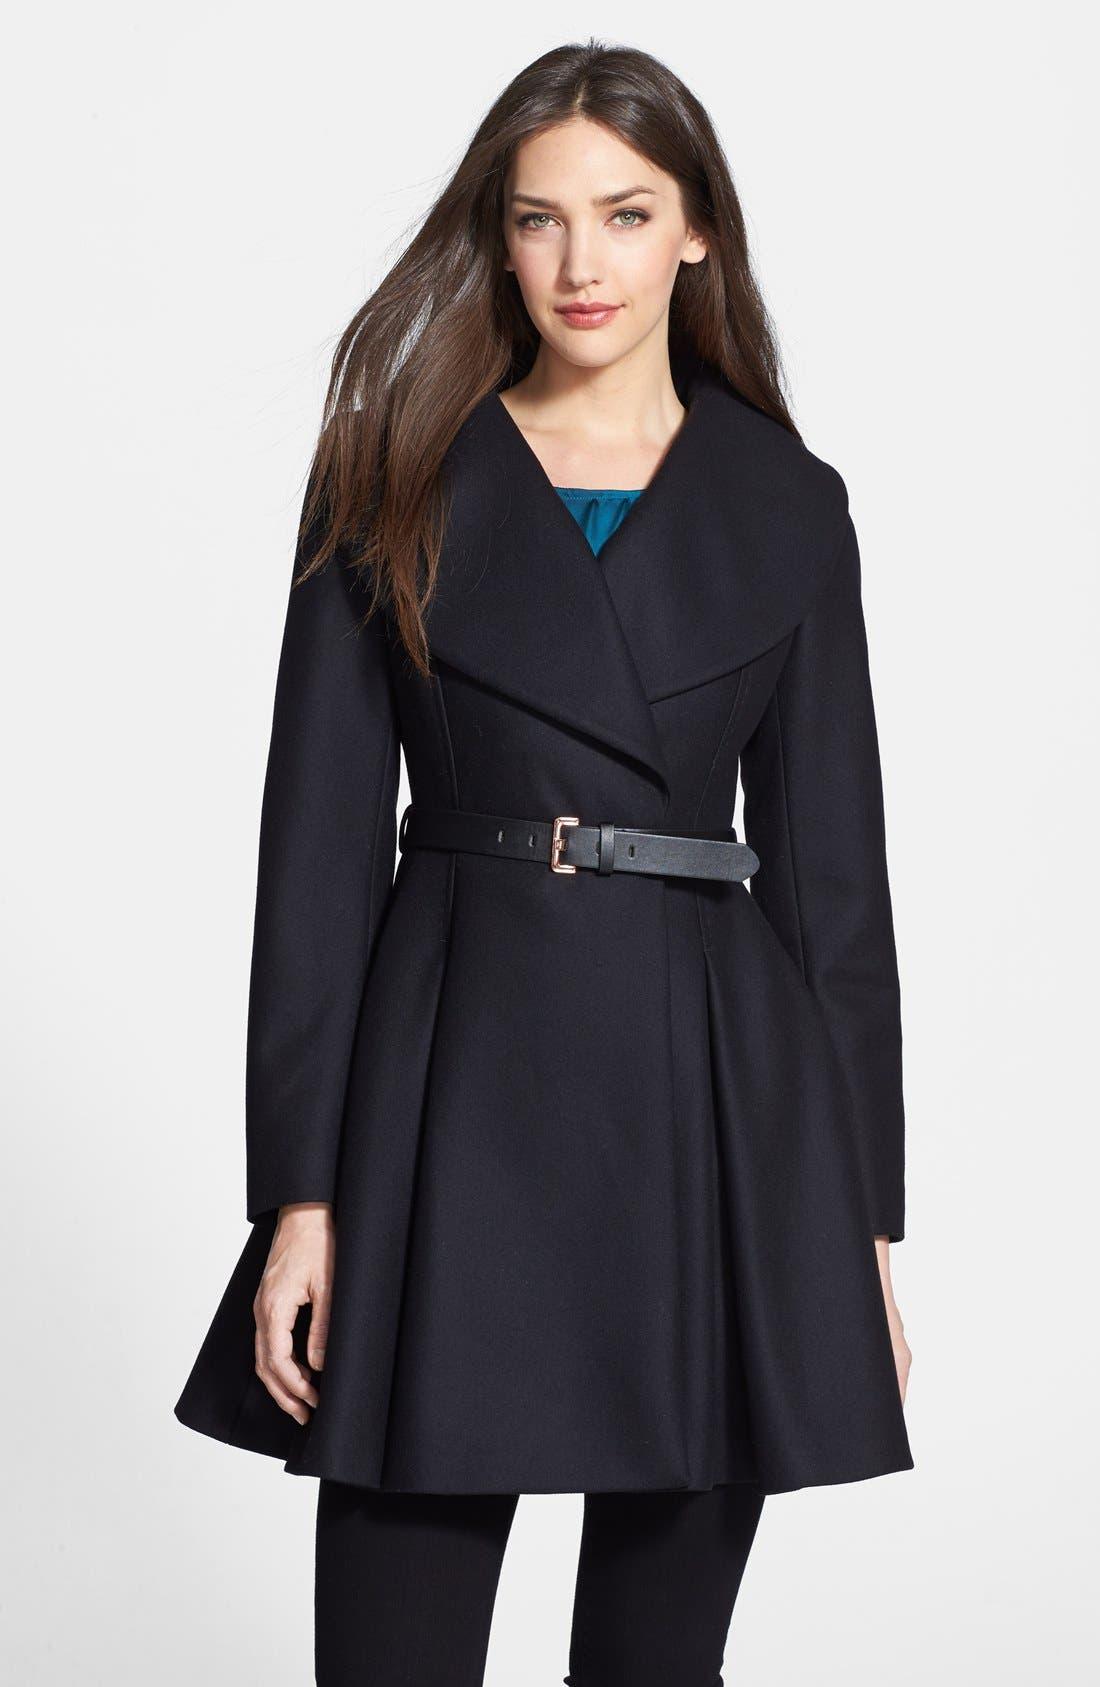 Main Image - Ted Baker London Belted Flare Skirt Wool & Cashmere Blend Coat